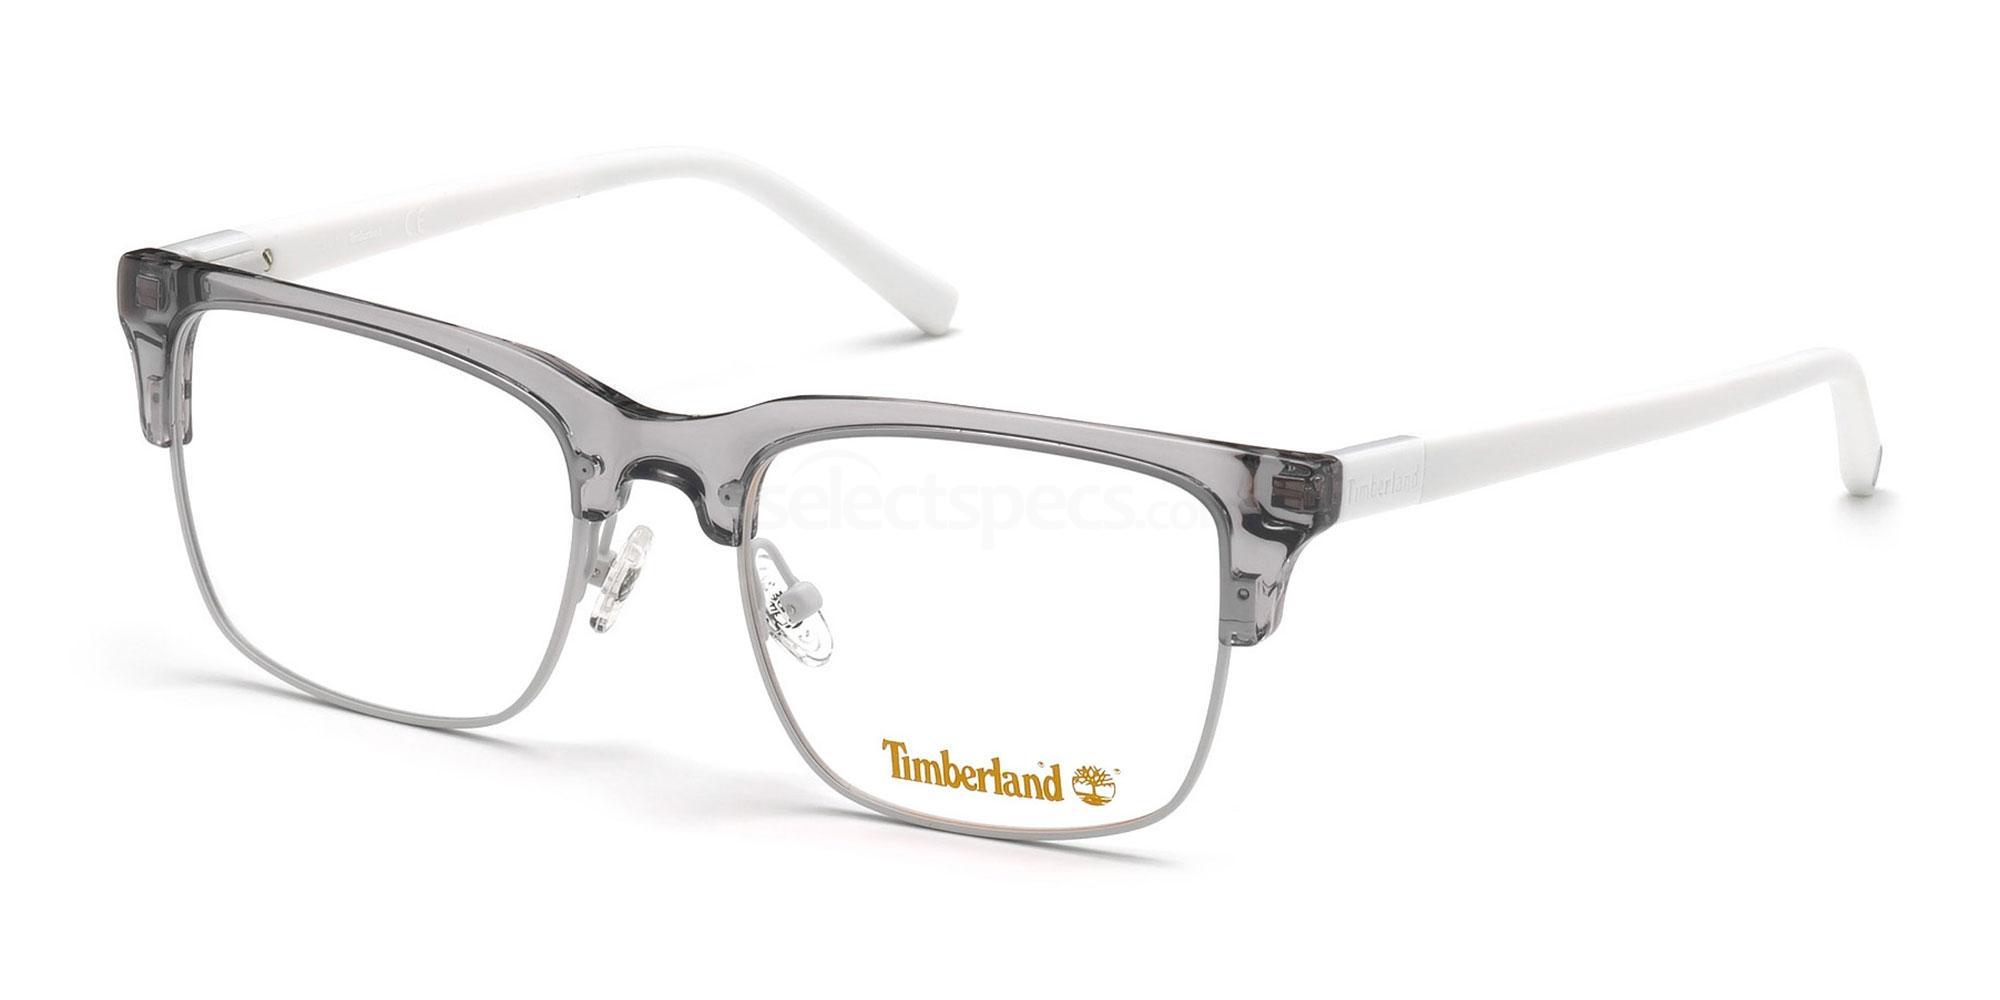 020 TB1601 Glasses, Timberland